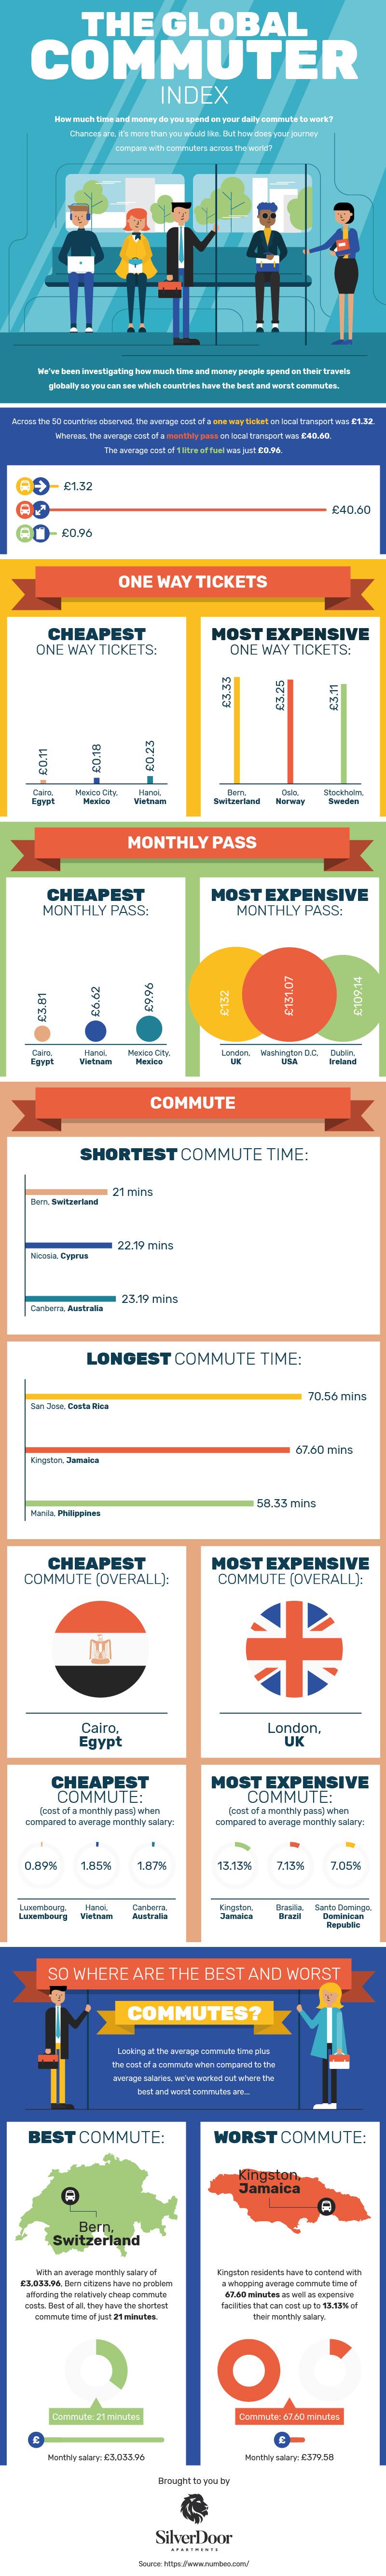 the-global-commuter-index.jpg?ooMediaId=2086